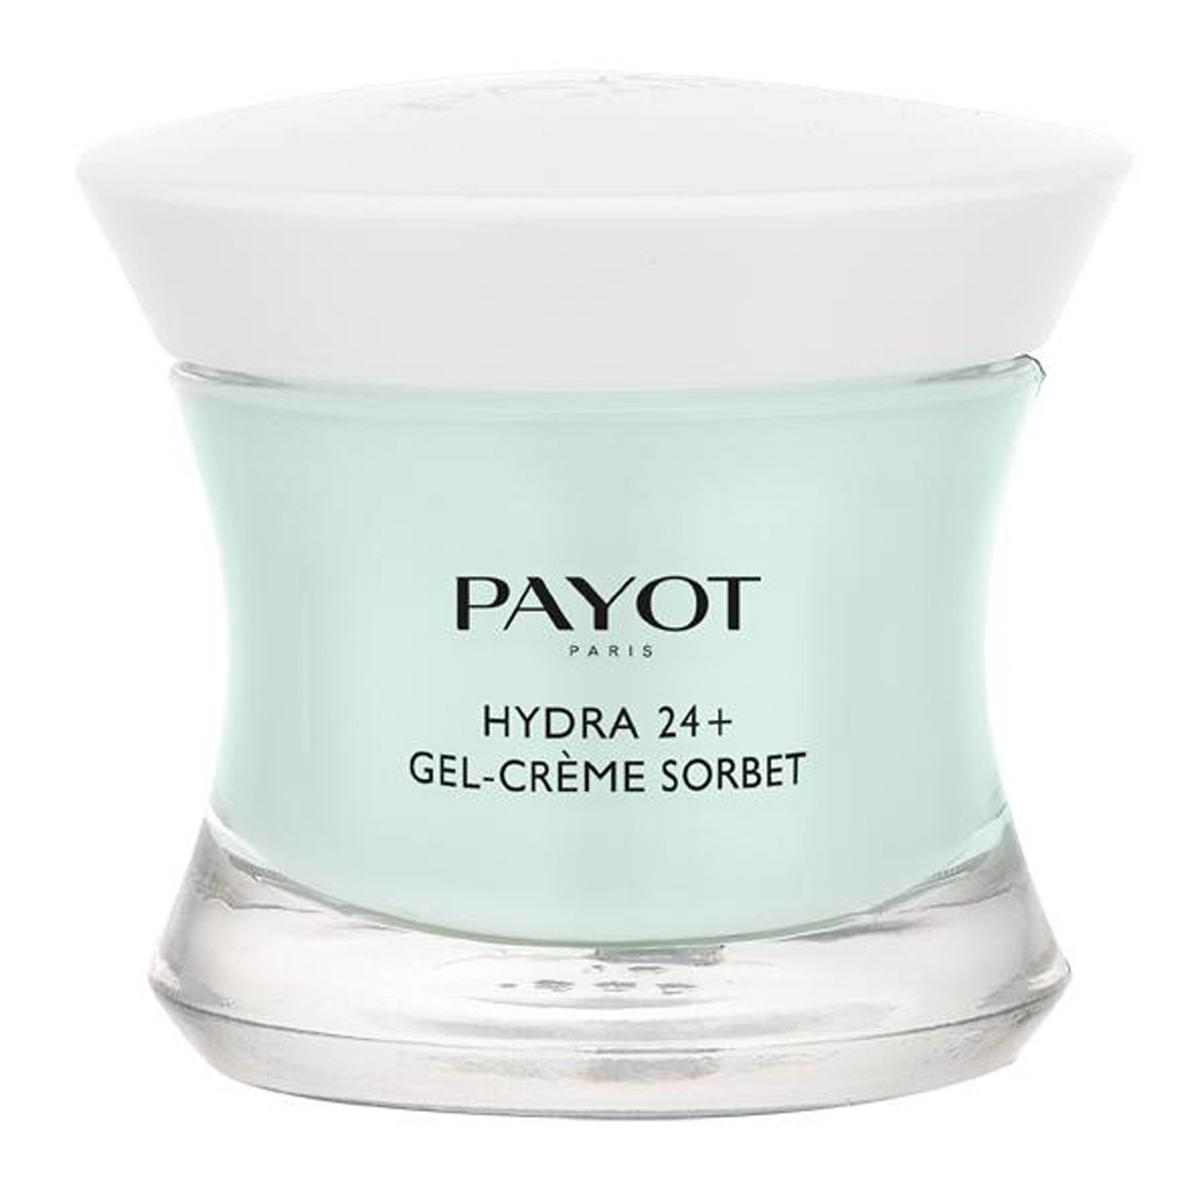 Payot Hydra 24+ Увлажняющий крем-гель, возвращающий контур коже, 50 мл payot hydra 24 увлажняющий бальзам стик для губ 4 мл